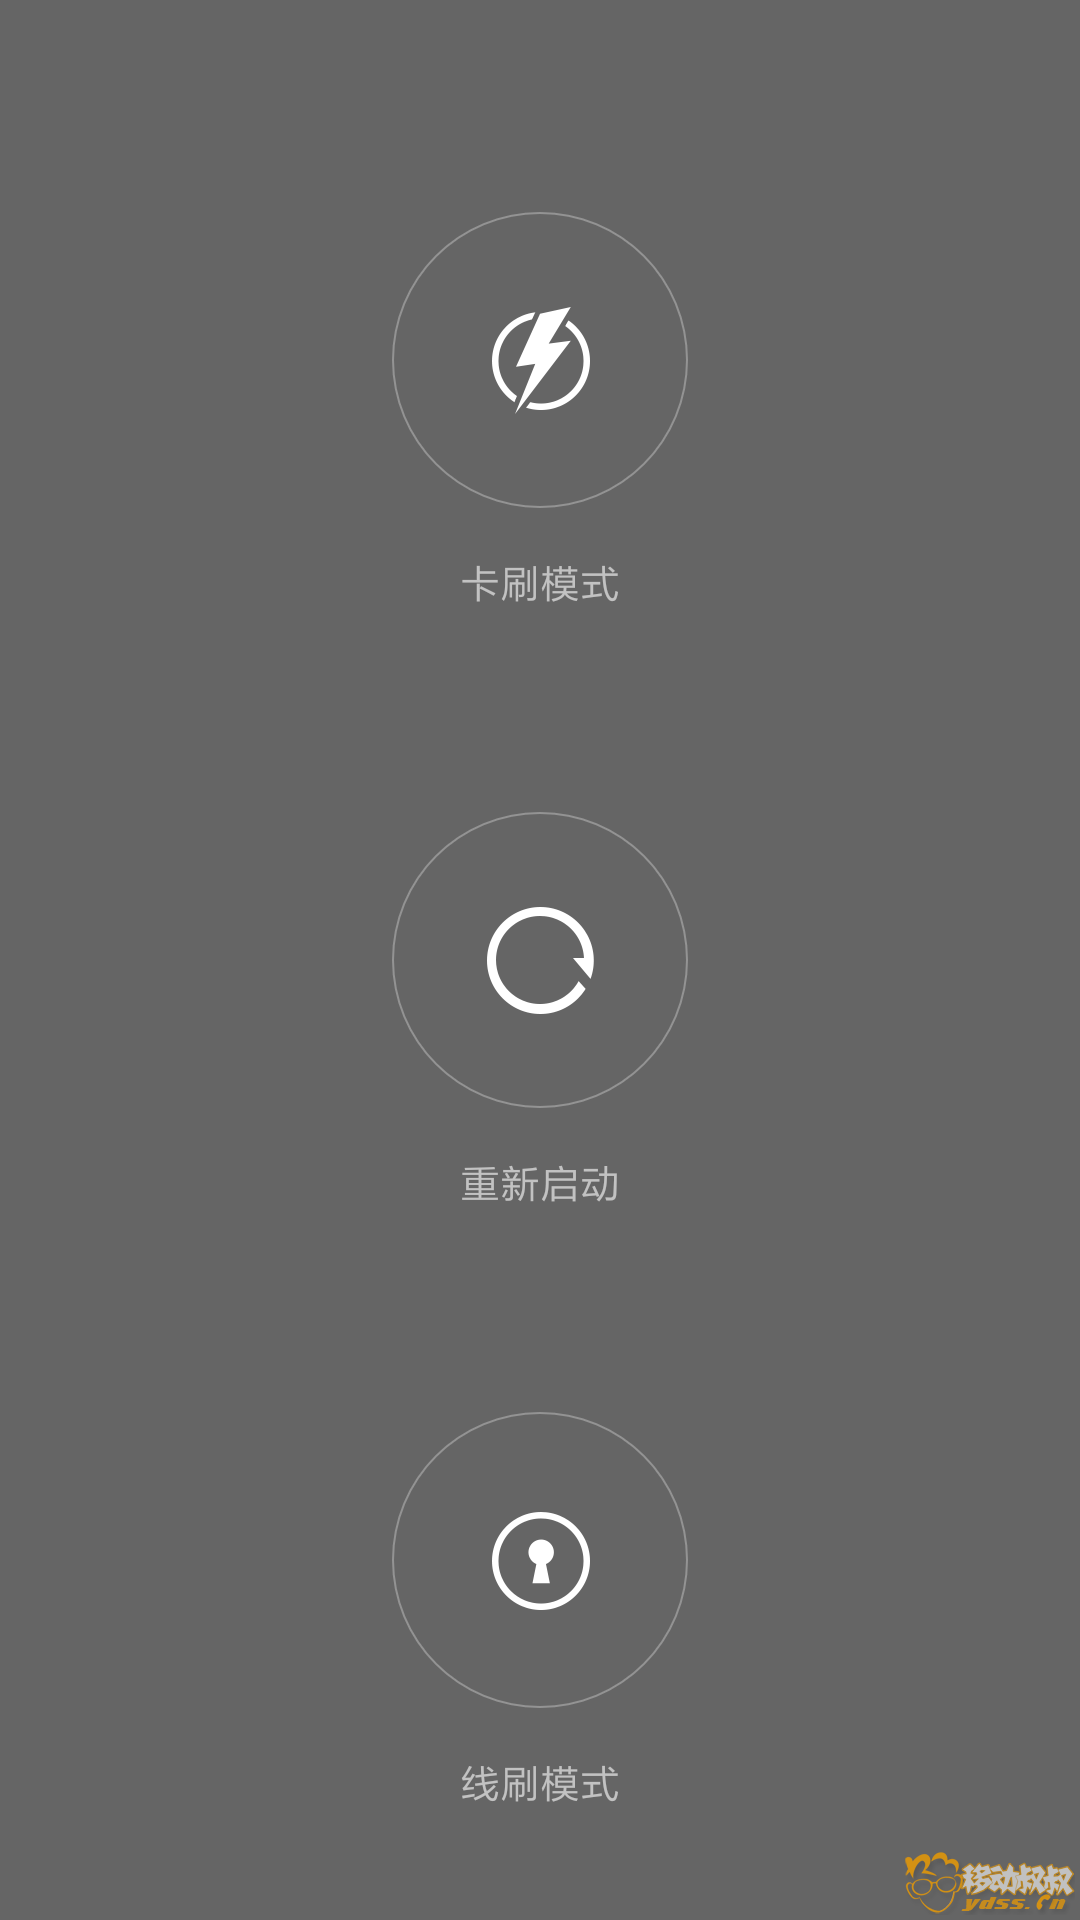 Screenshot_2017-08-10-10-36-40-559_com.android.settings.png